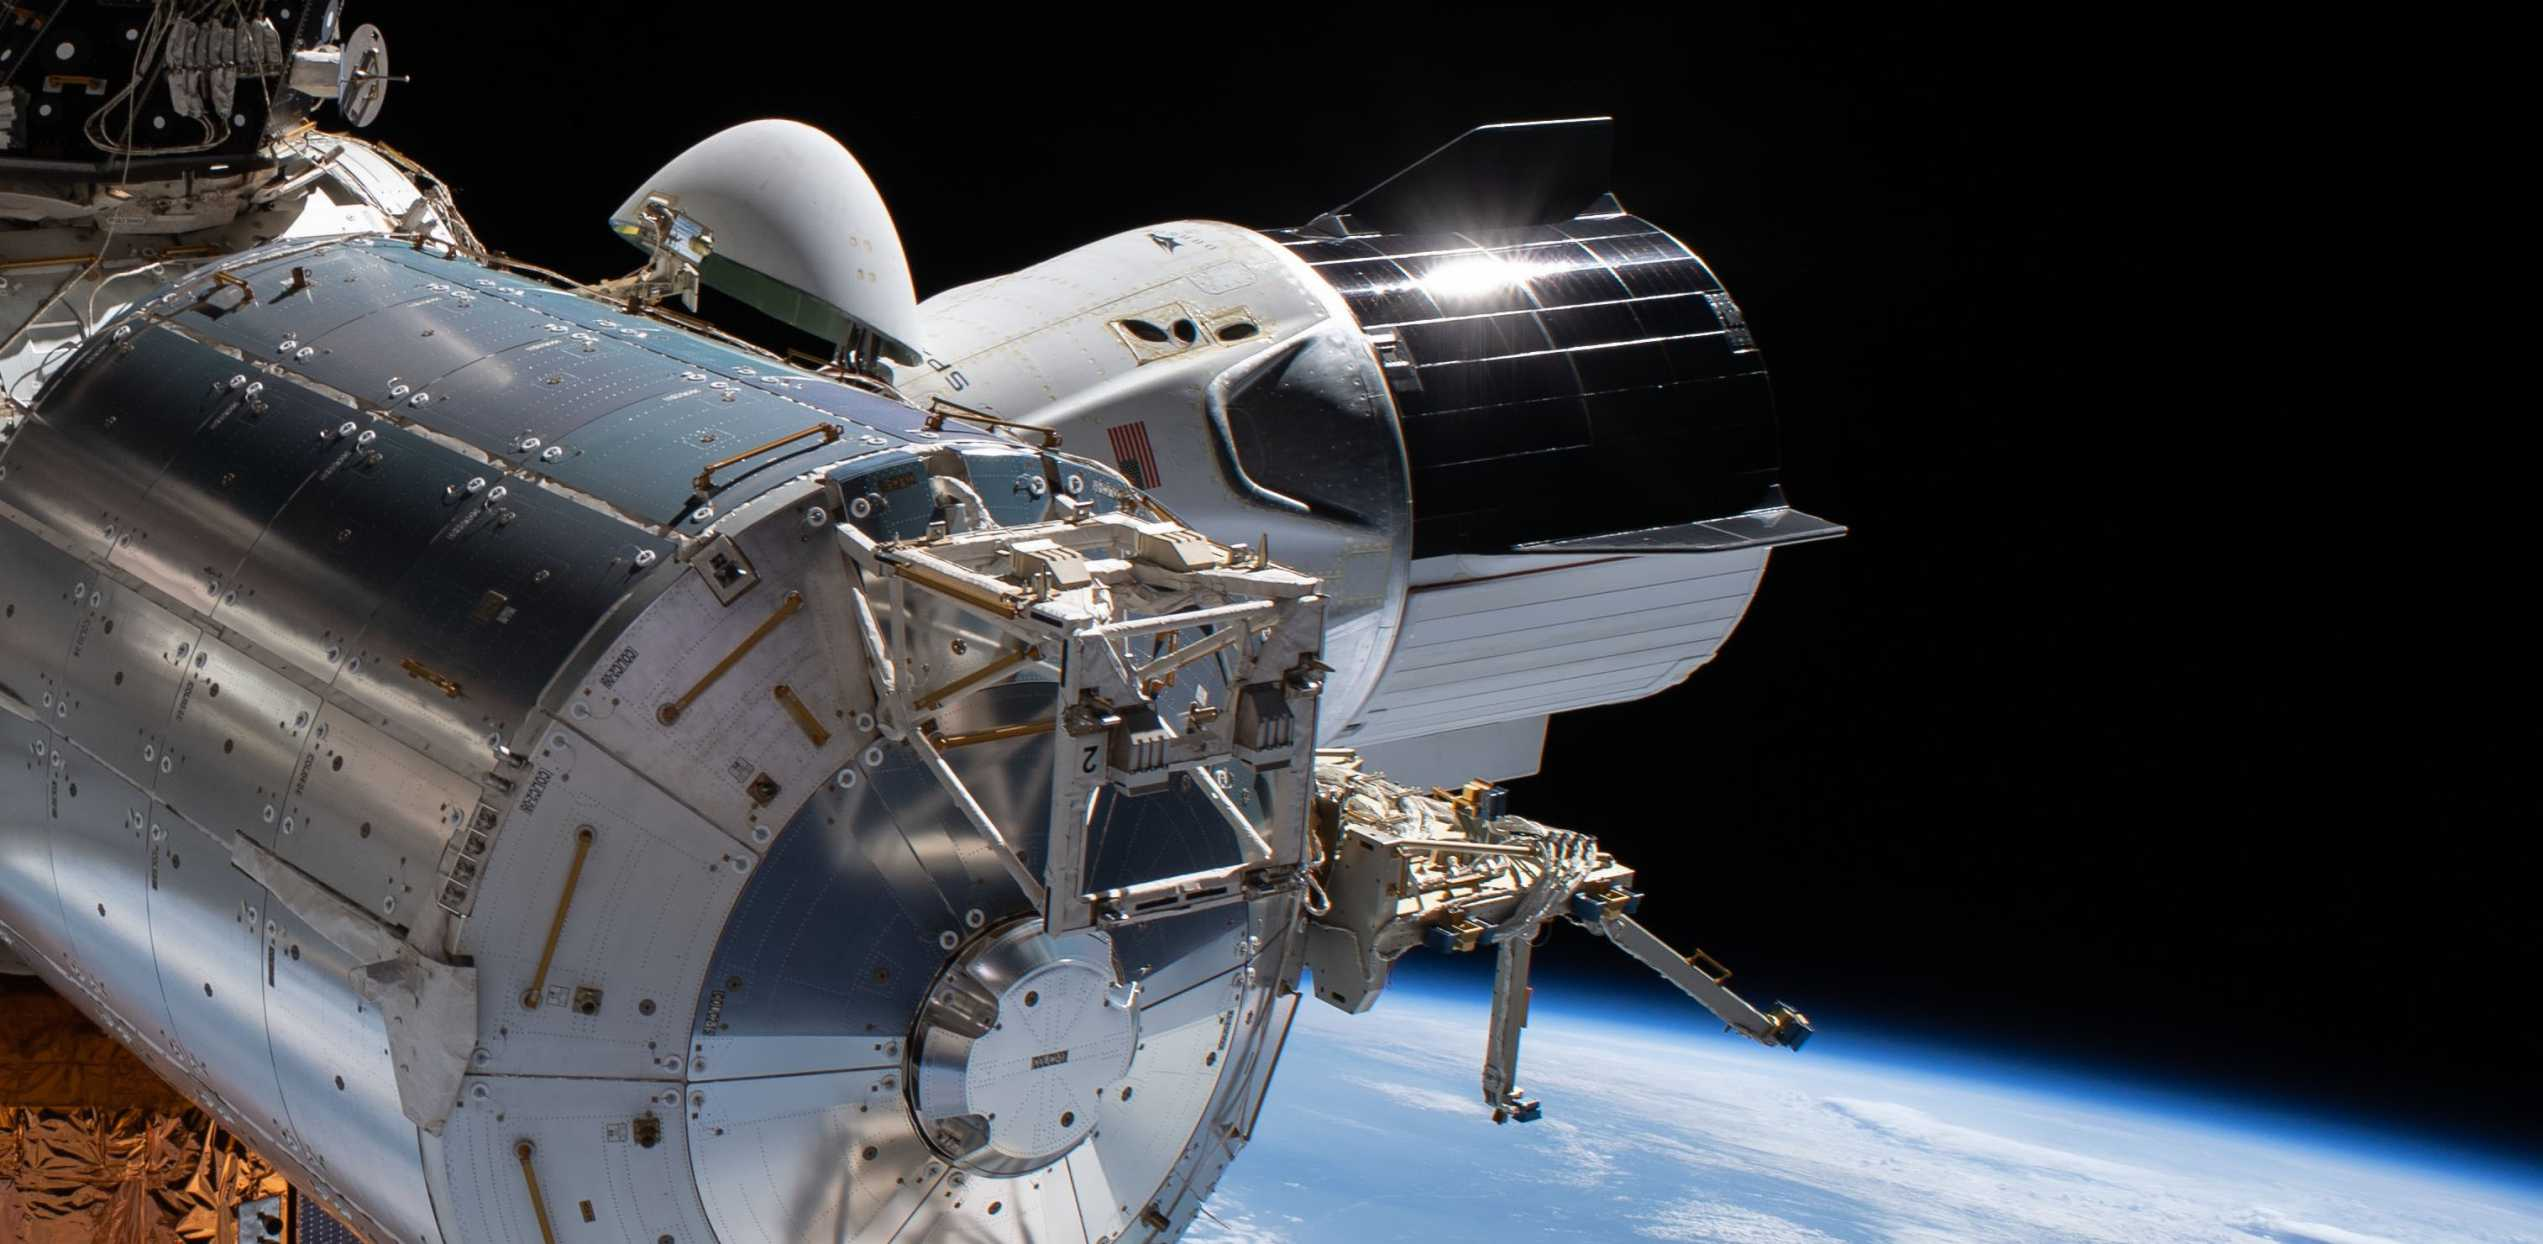 SpaceX Crew Dragon C206 Demo-2 ISS spacewalk 070120 (NASA) 2 crop 3 (c)